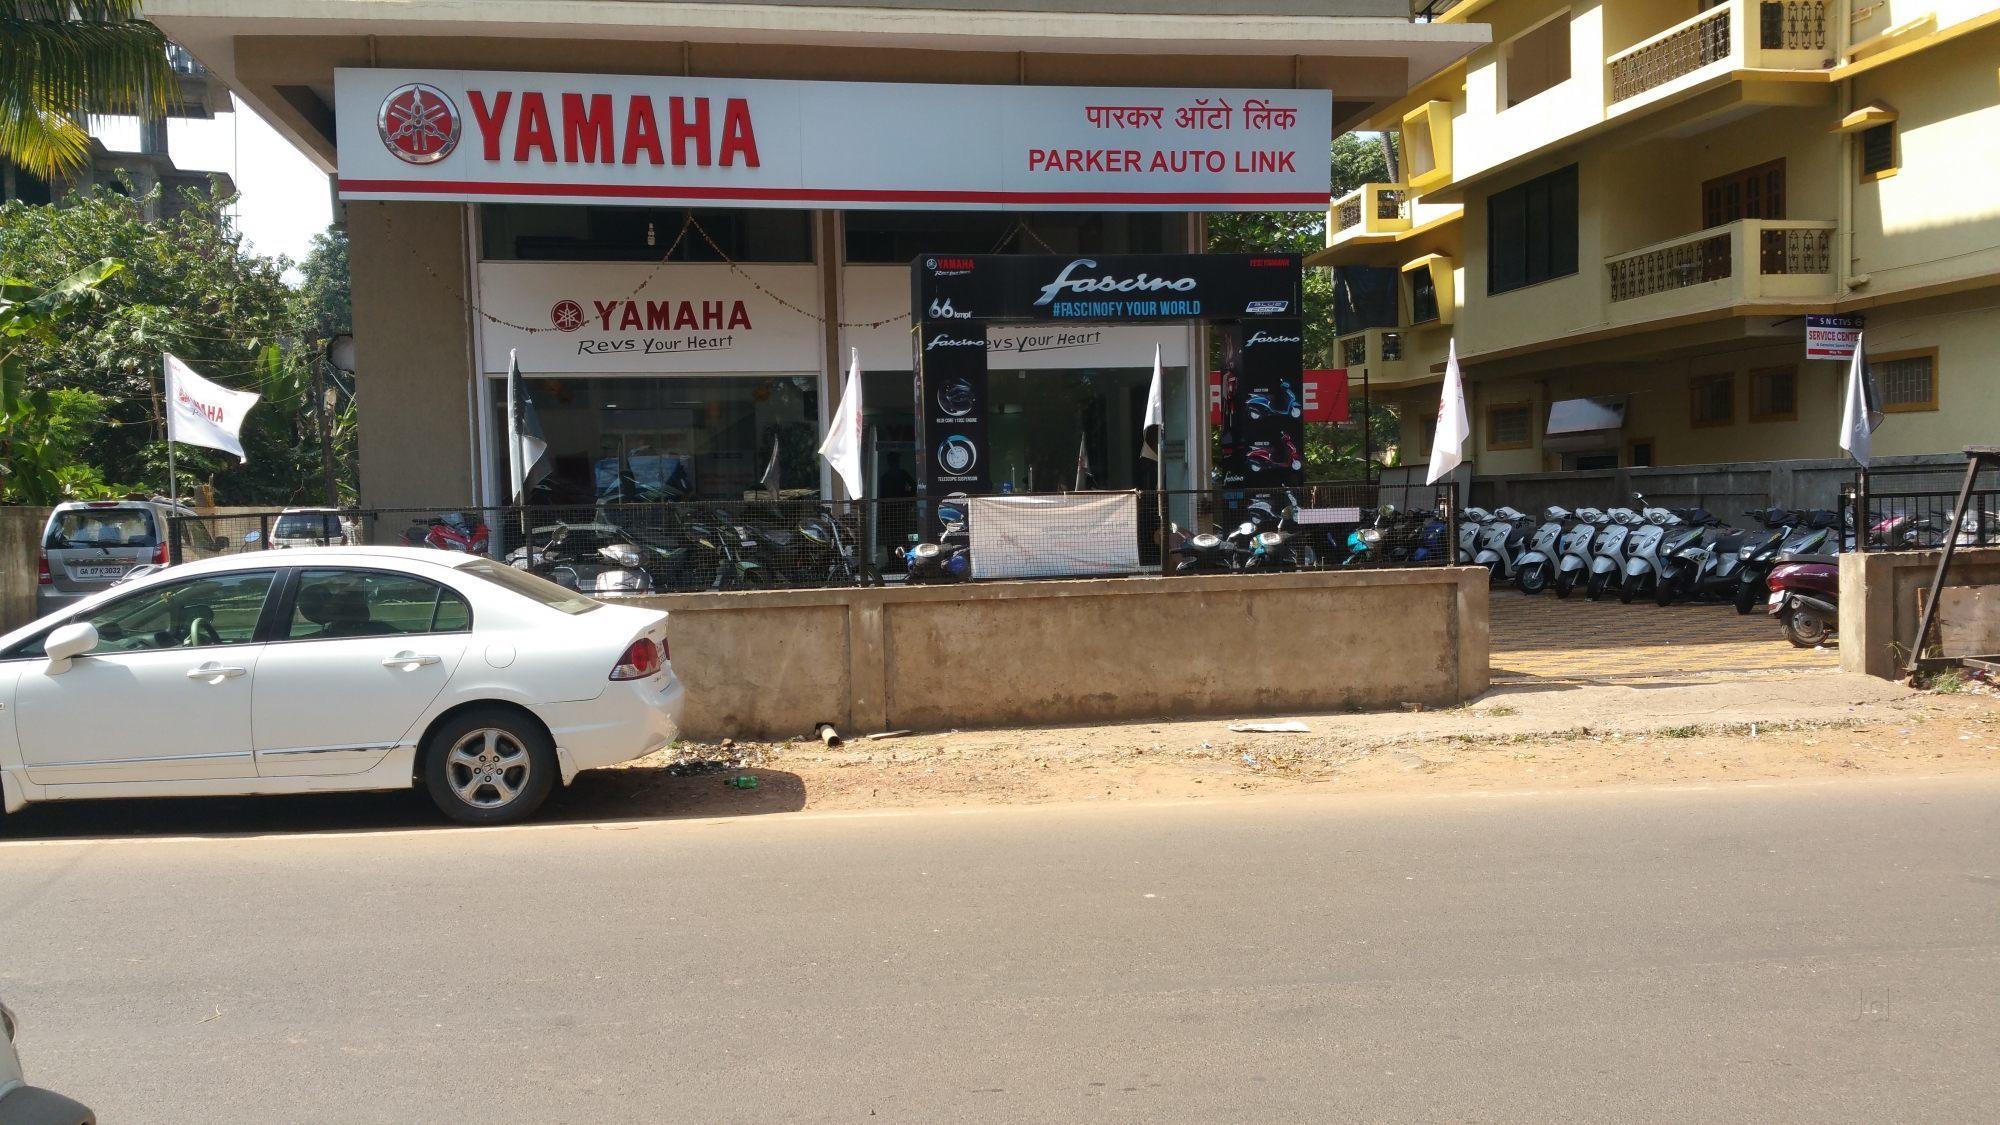 Top 10 Yamaha Motorcycle Showrooms in Goa - Yamaha Bikes